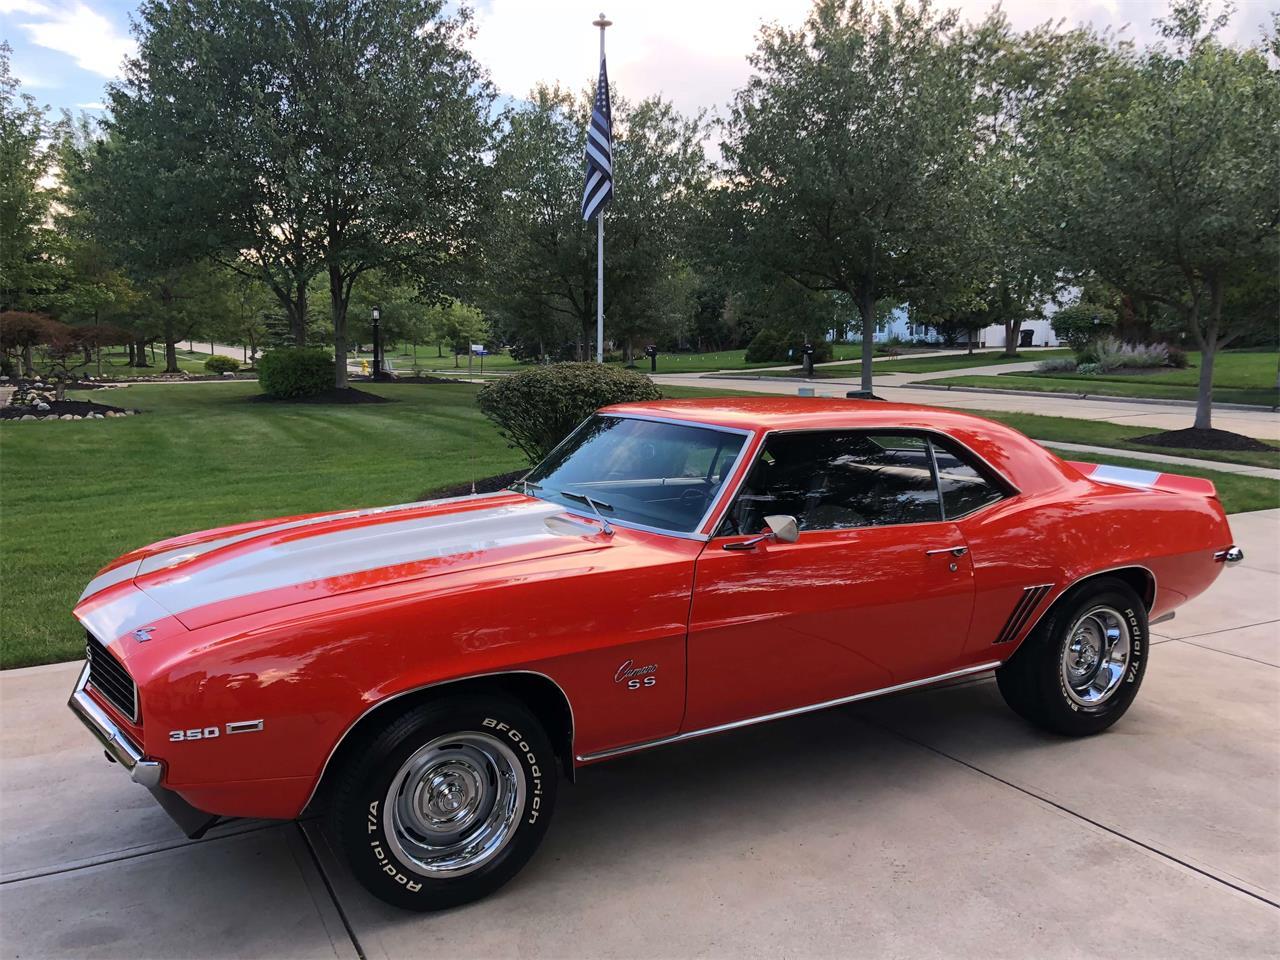 For Sale 1969 Chevrolet Camaro Ss In North Royalton Ohio